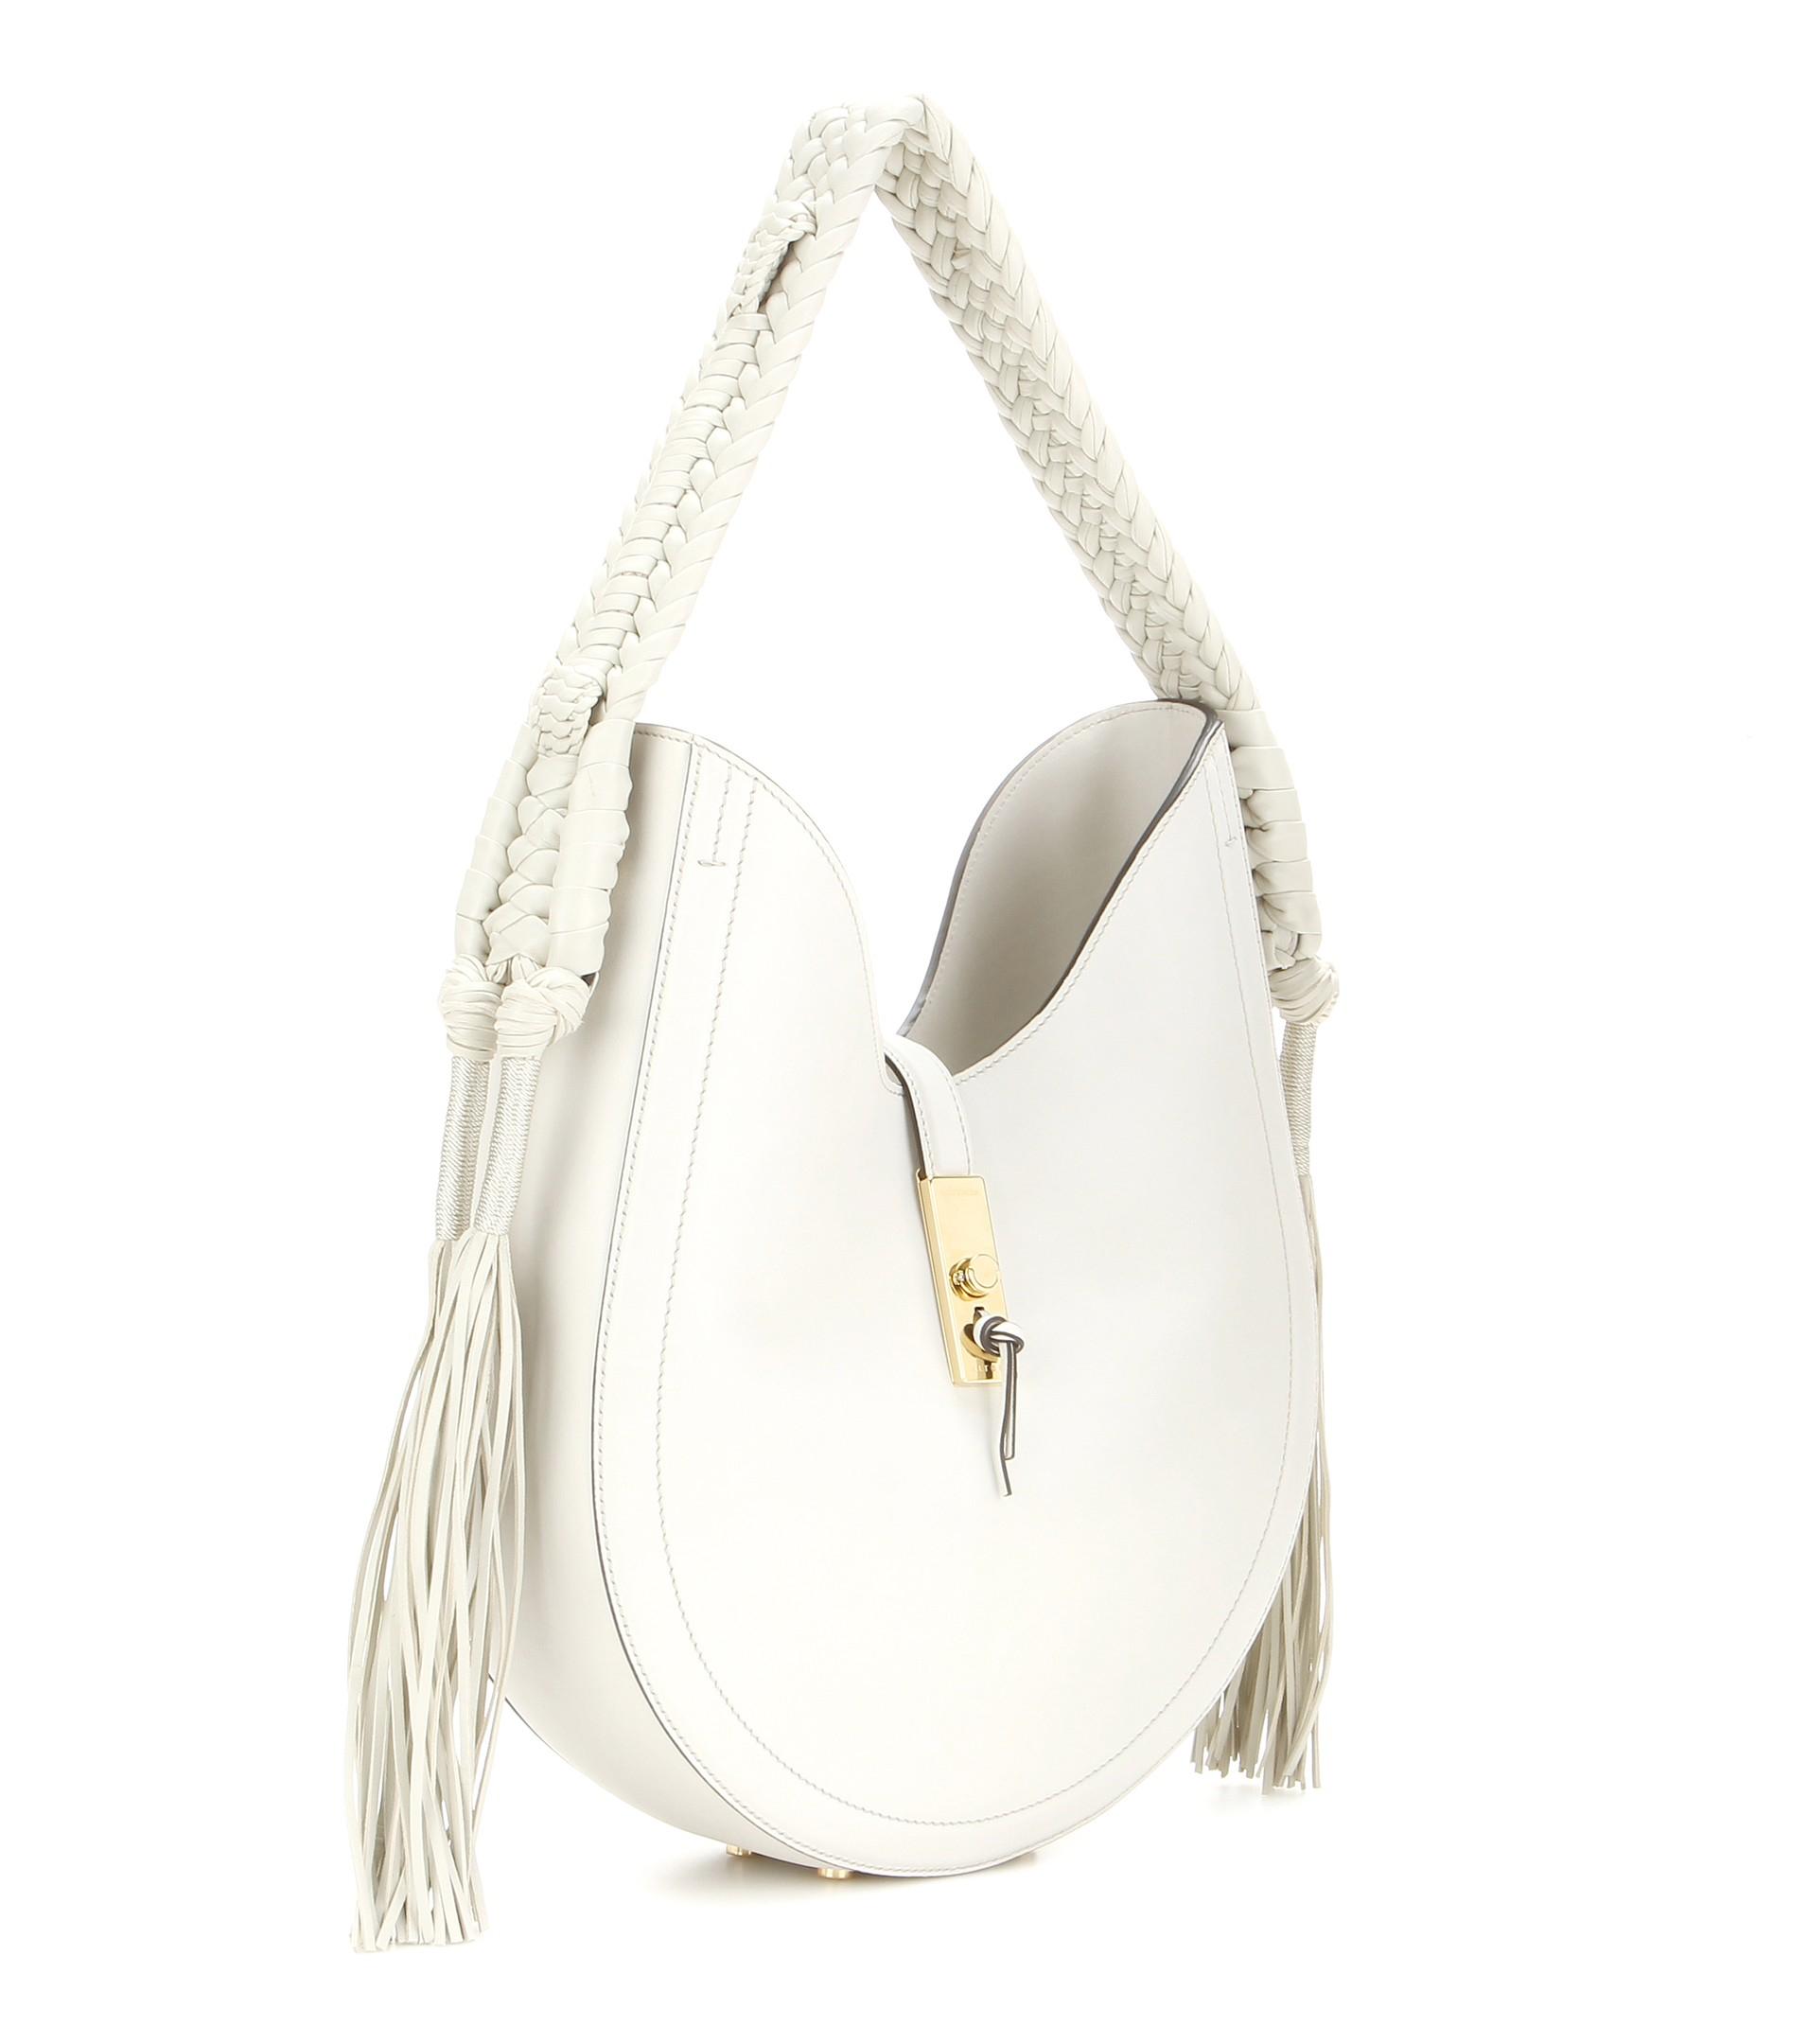 ff7c5a6f16de Lyst - Altuzarra Ghianda Bullrope Hobo Leather Shoulder Bag in White